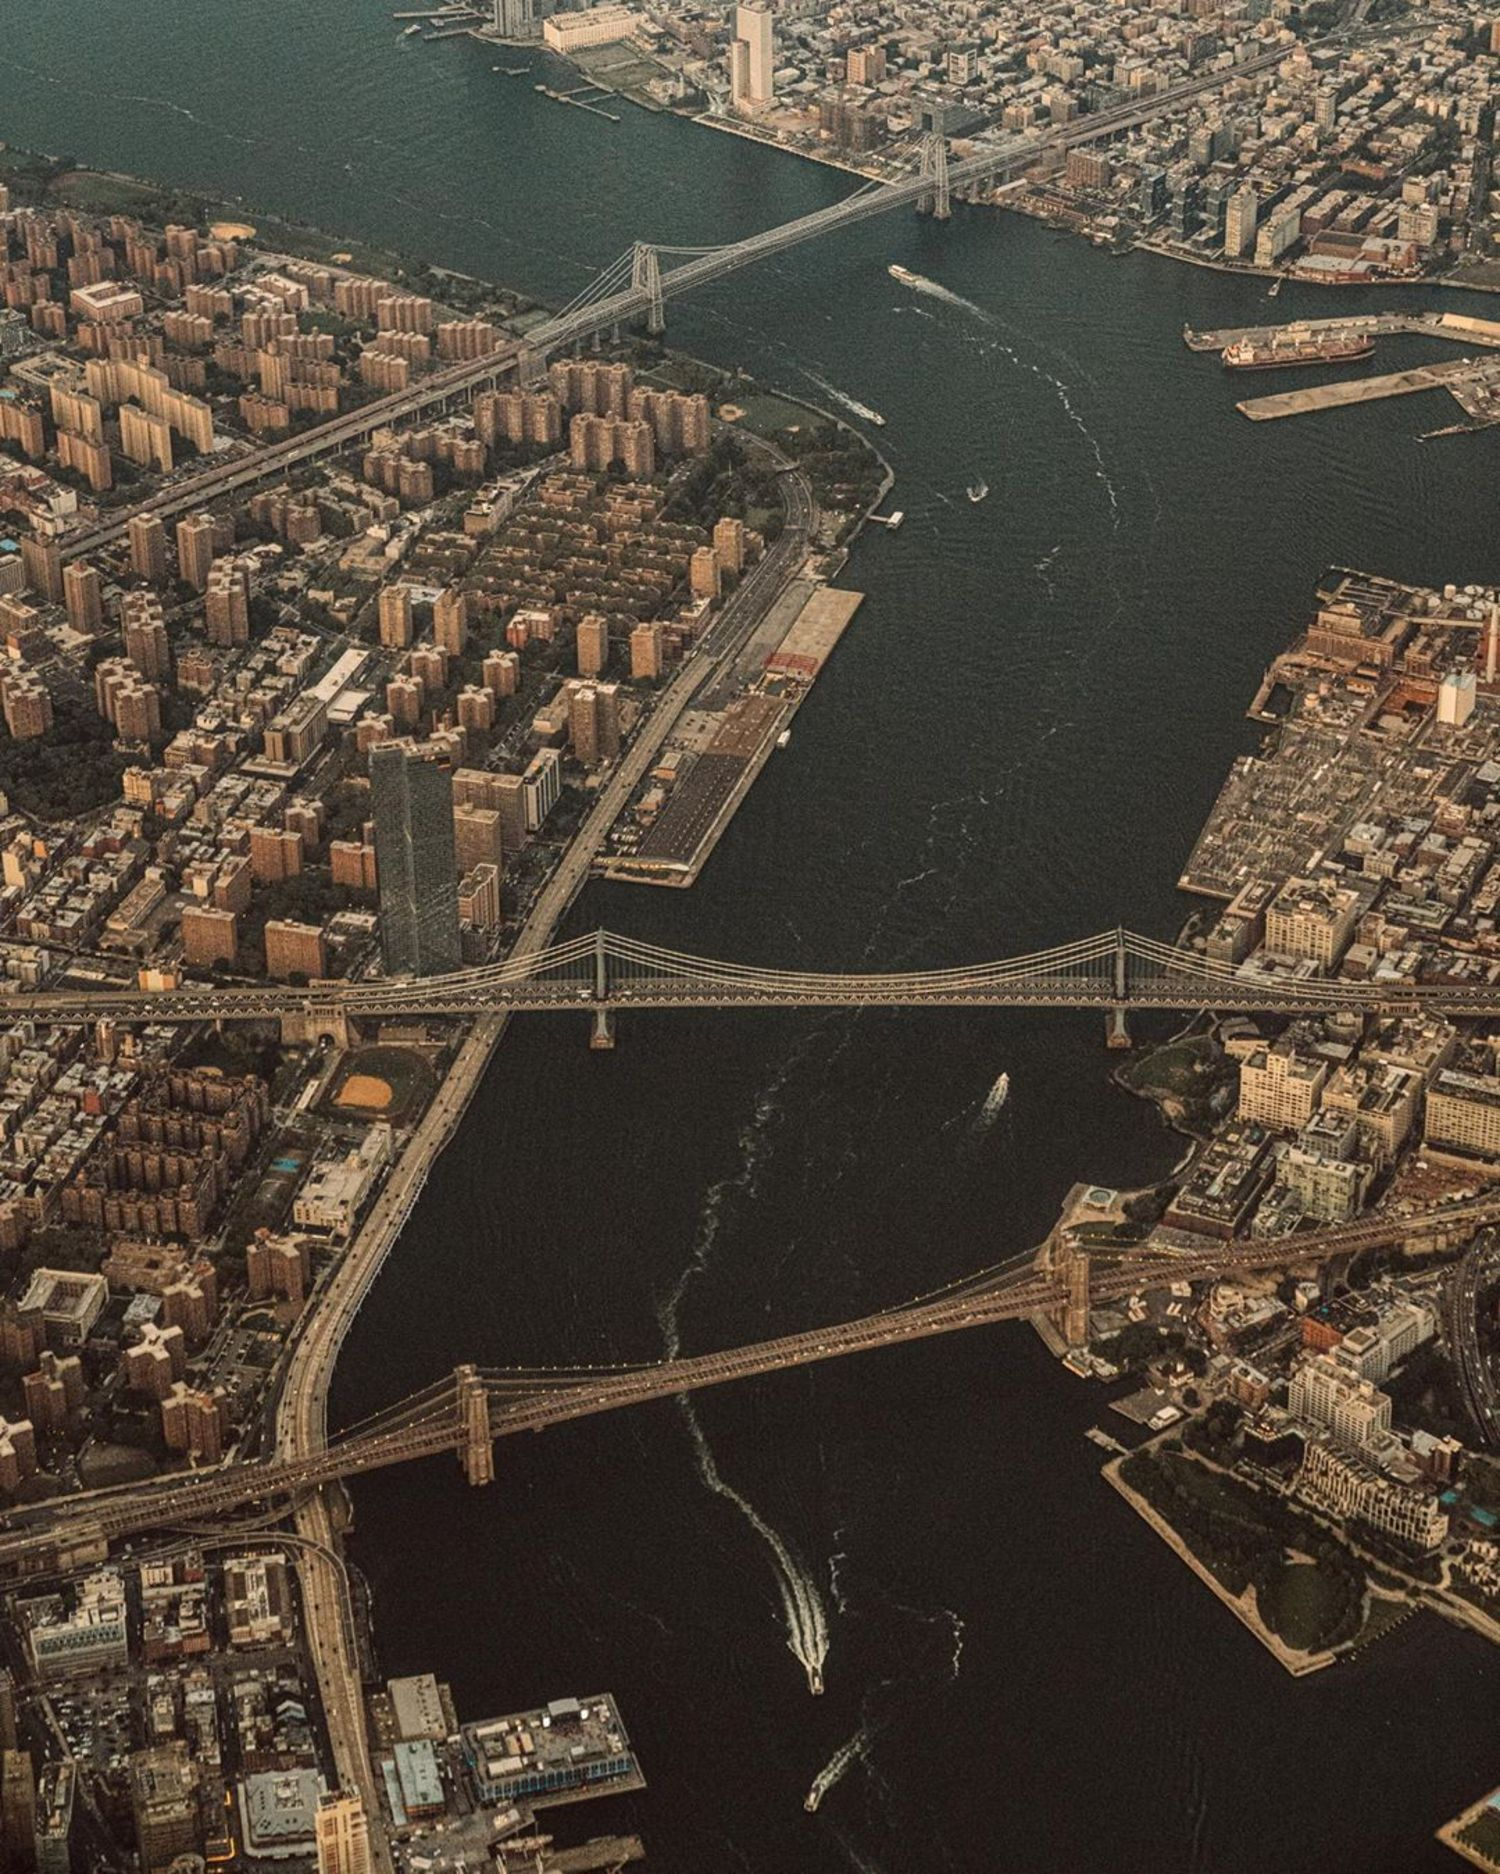 East River, Manhattan/Brooklyn